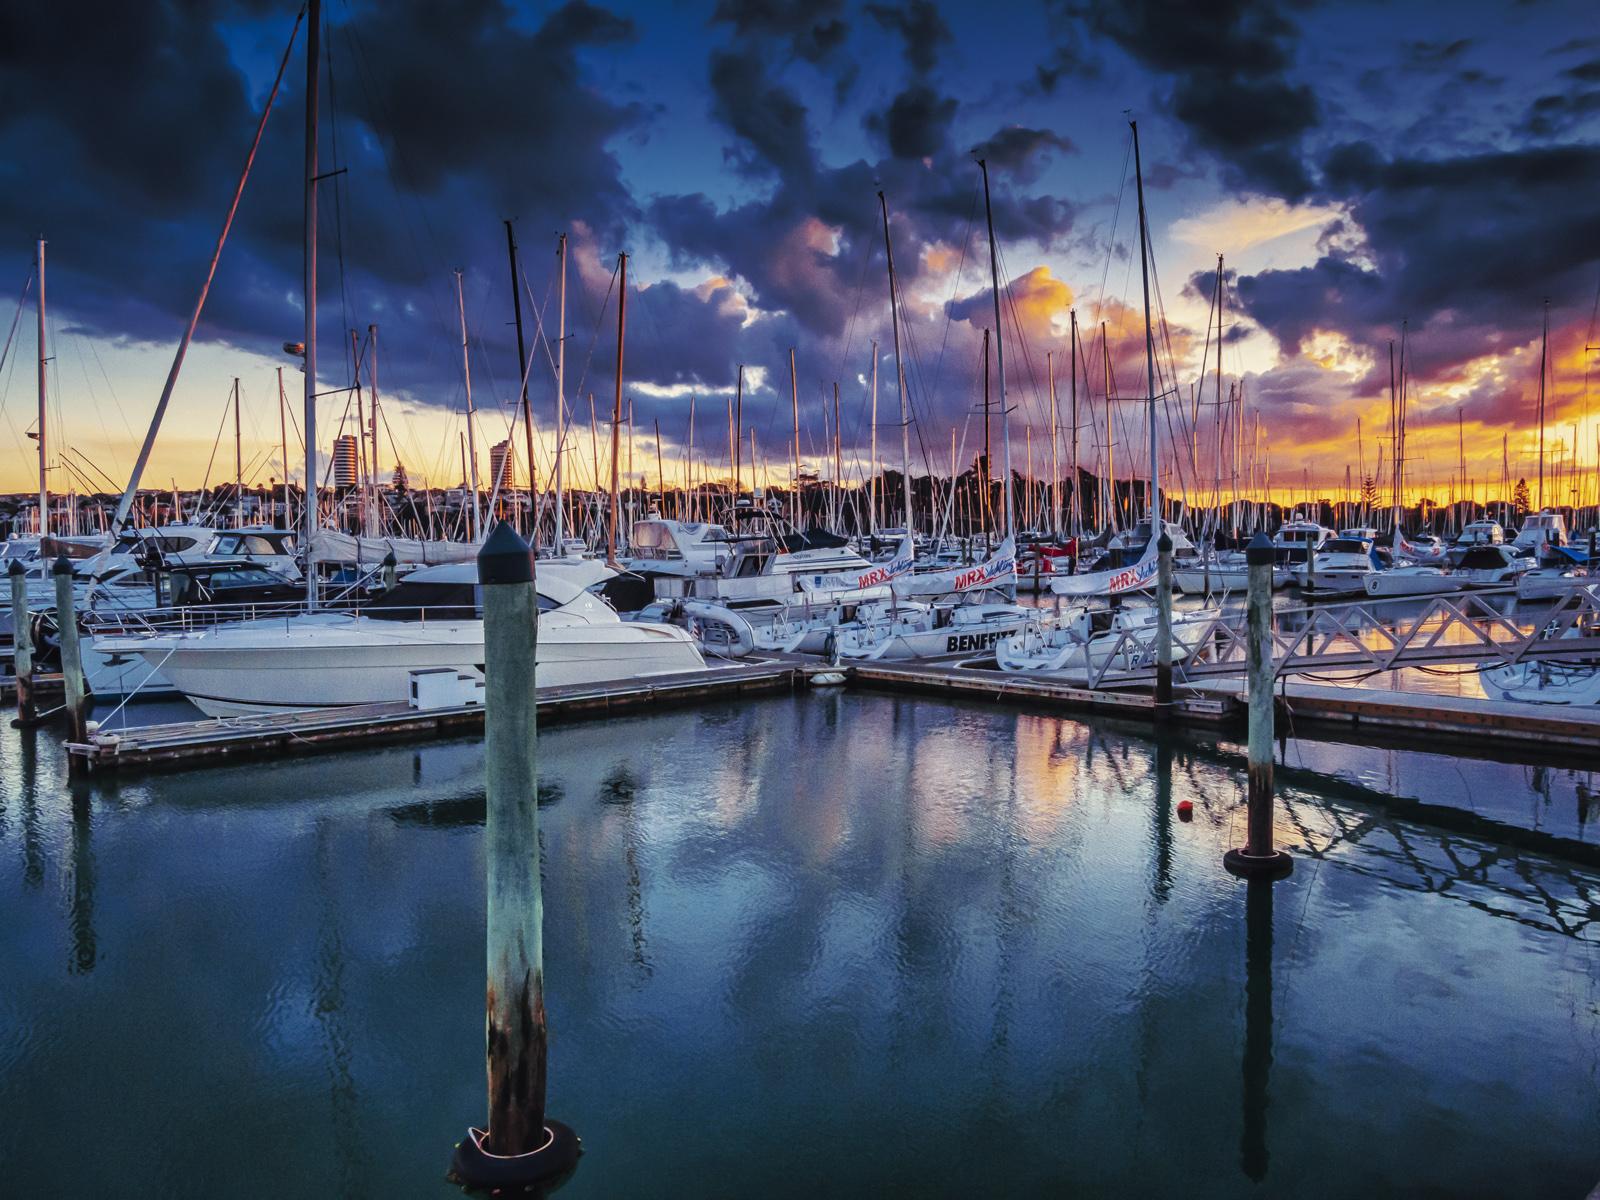 2. westhaven marina sunset.ken waller